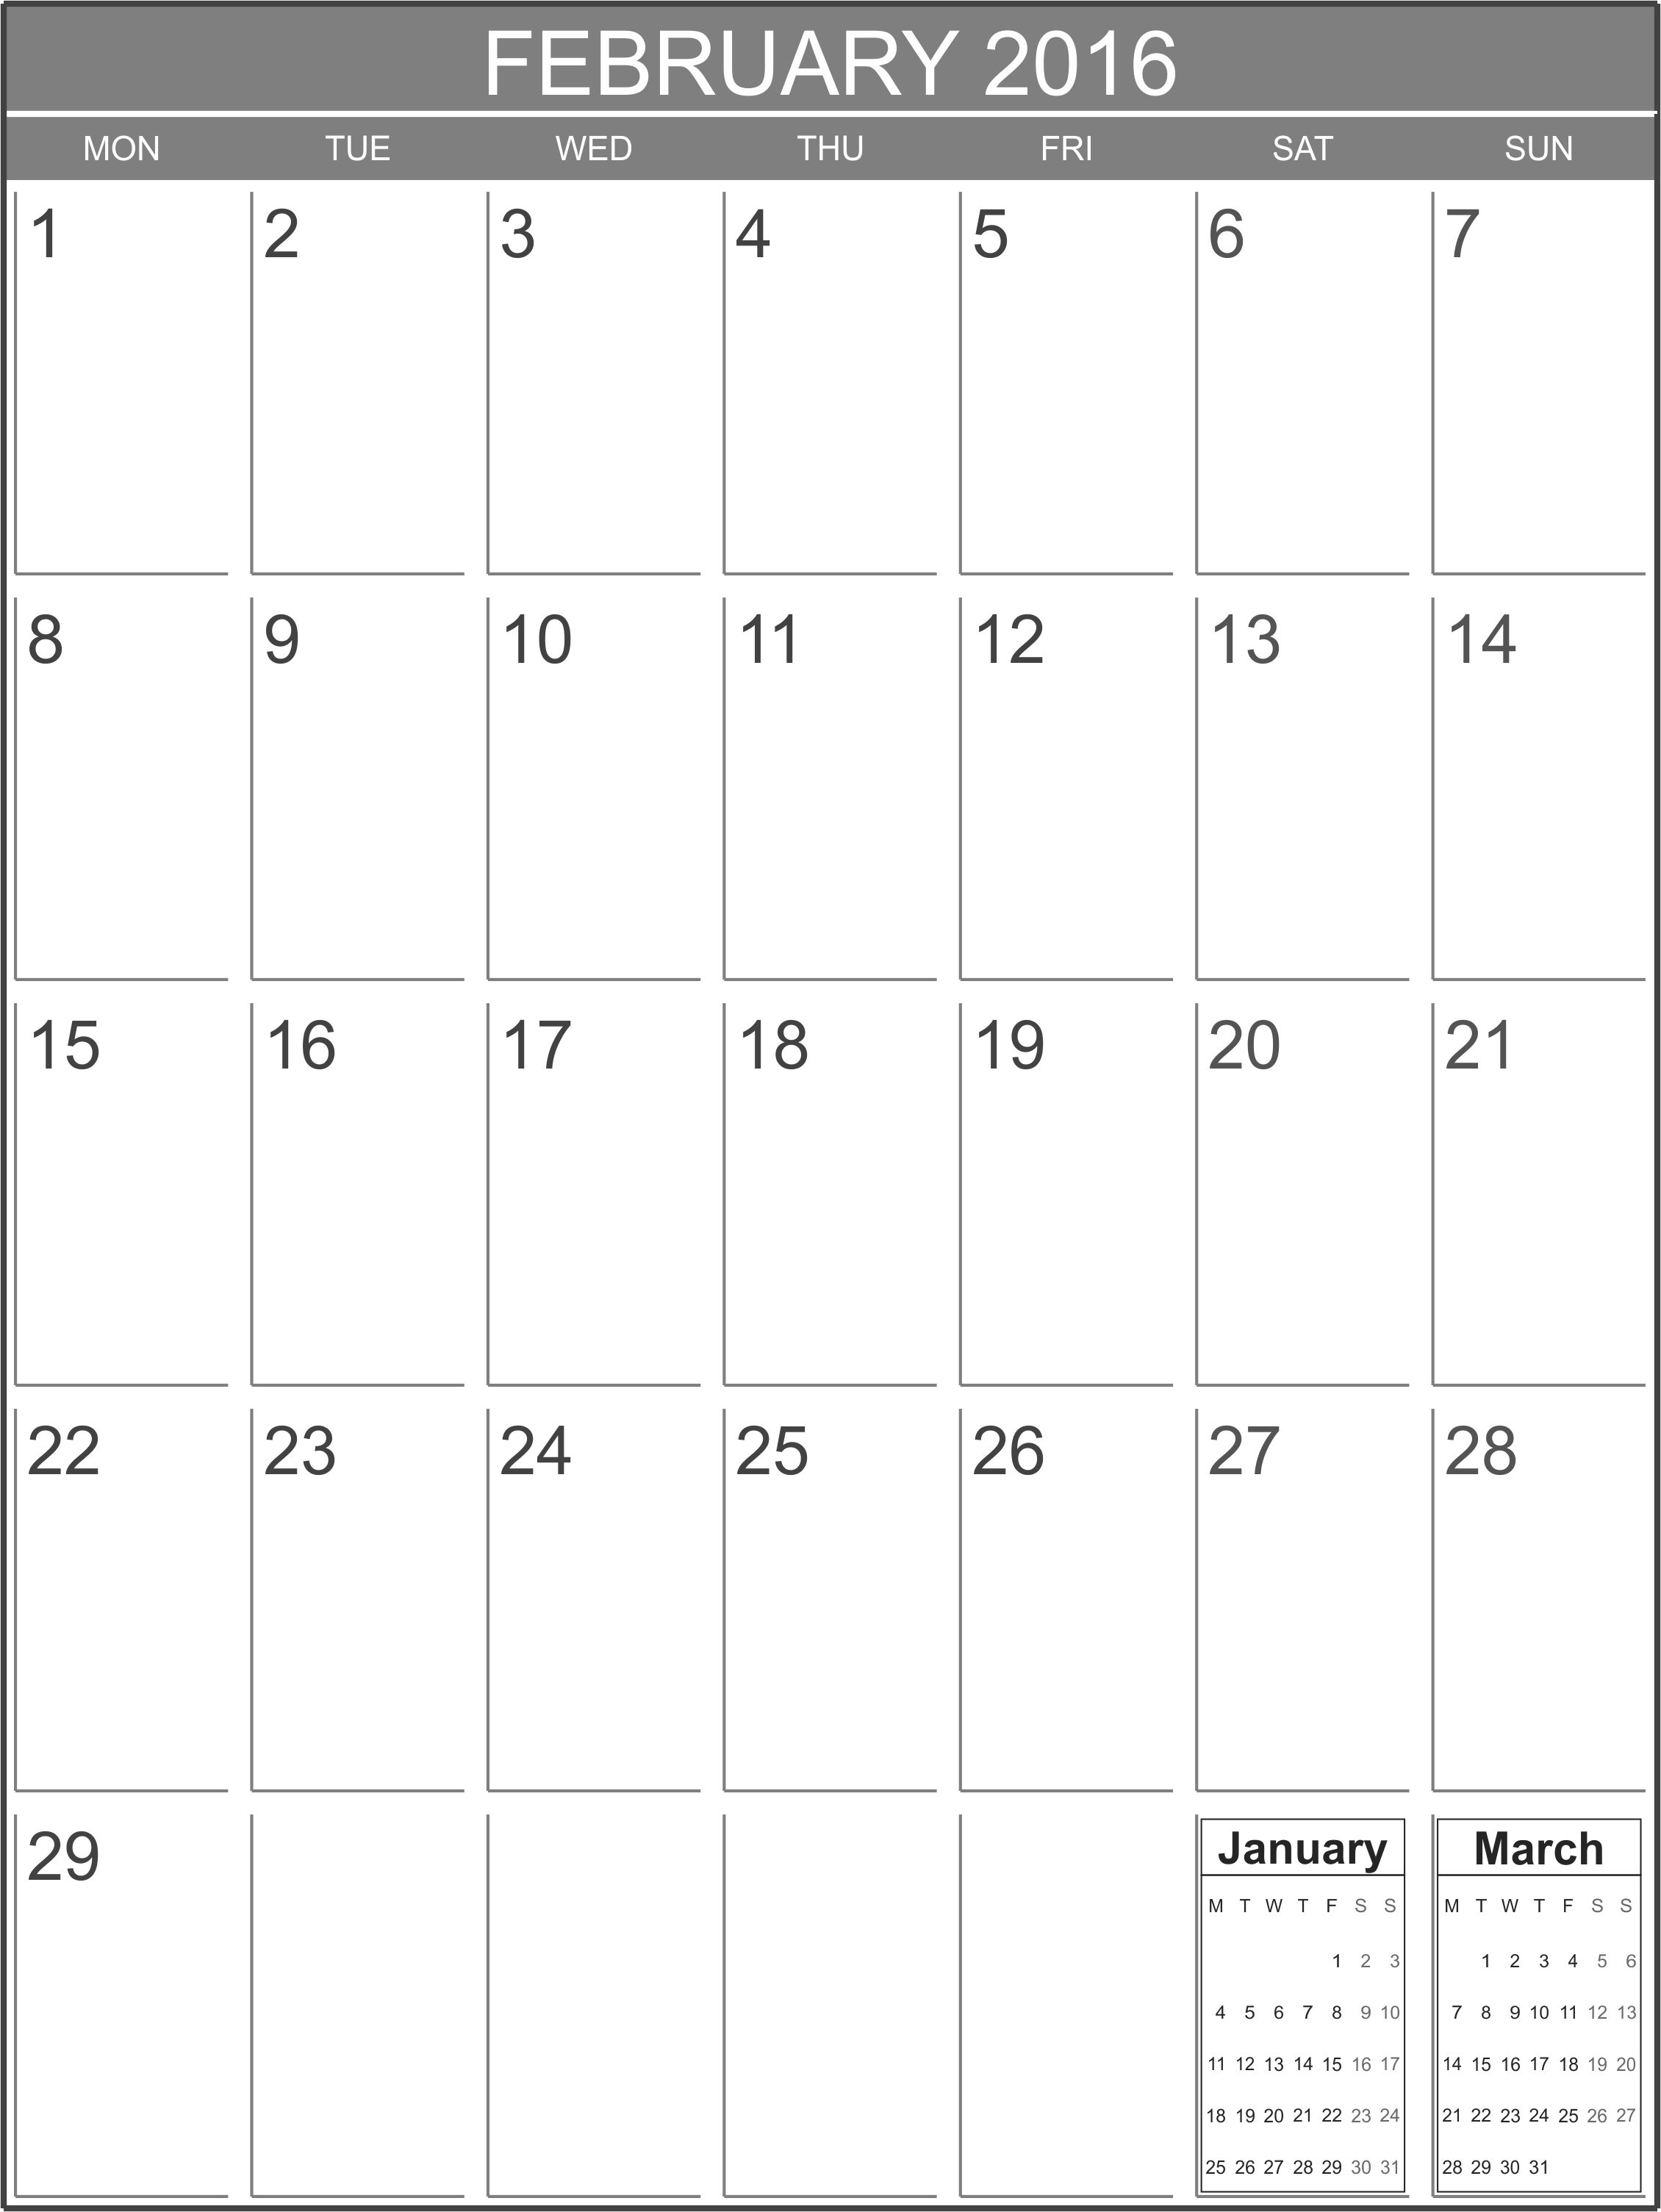 February 2016 blank calendar template - Printable Blank Calendar.org